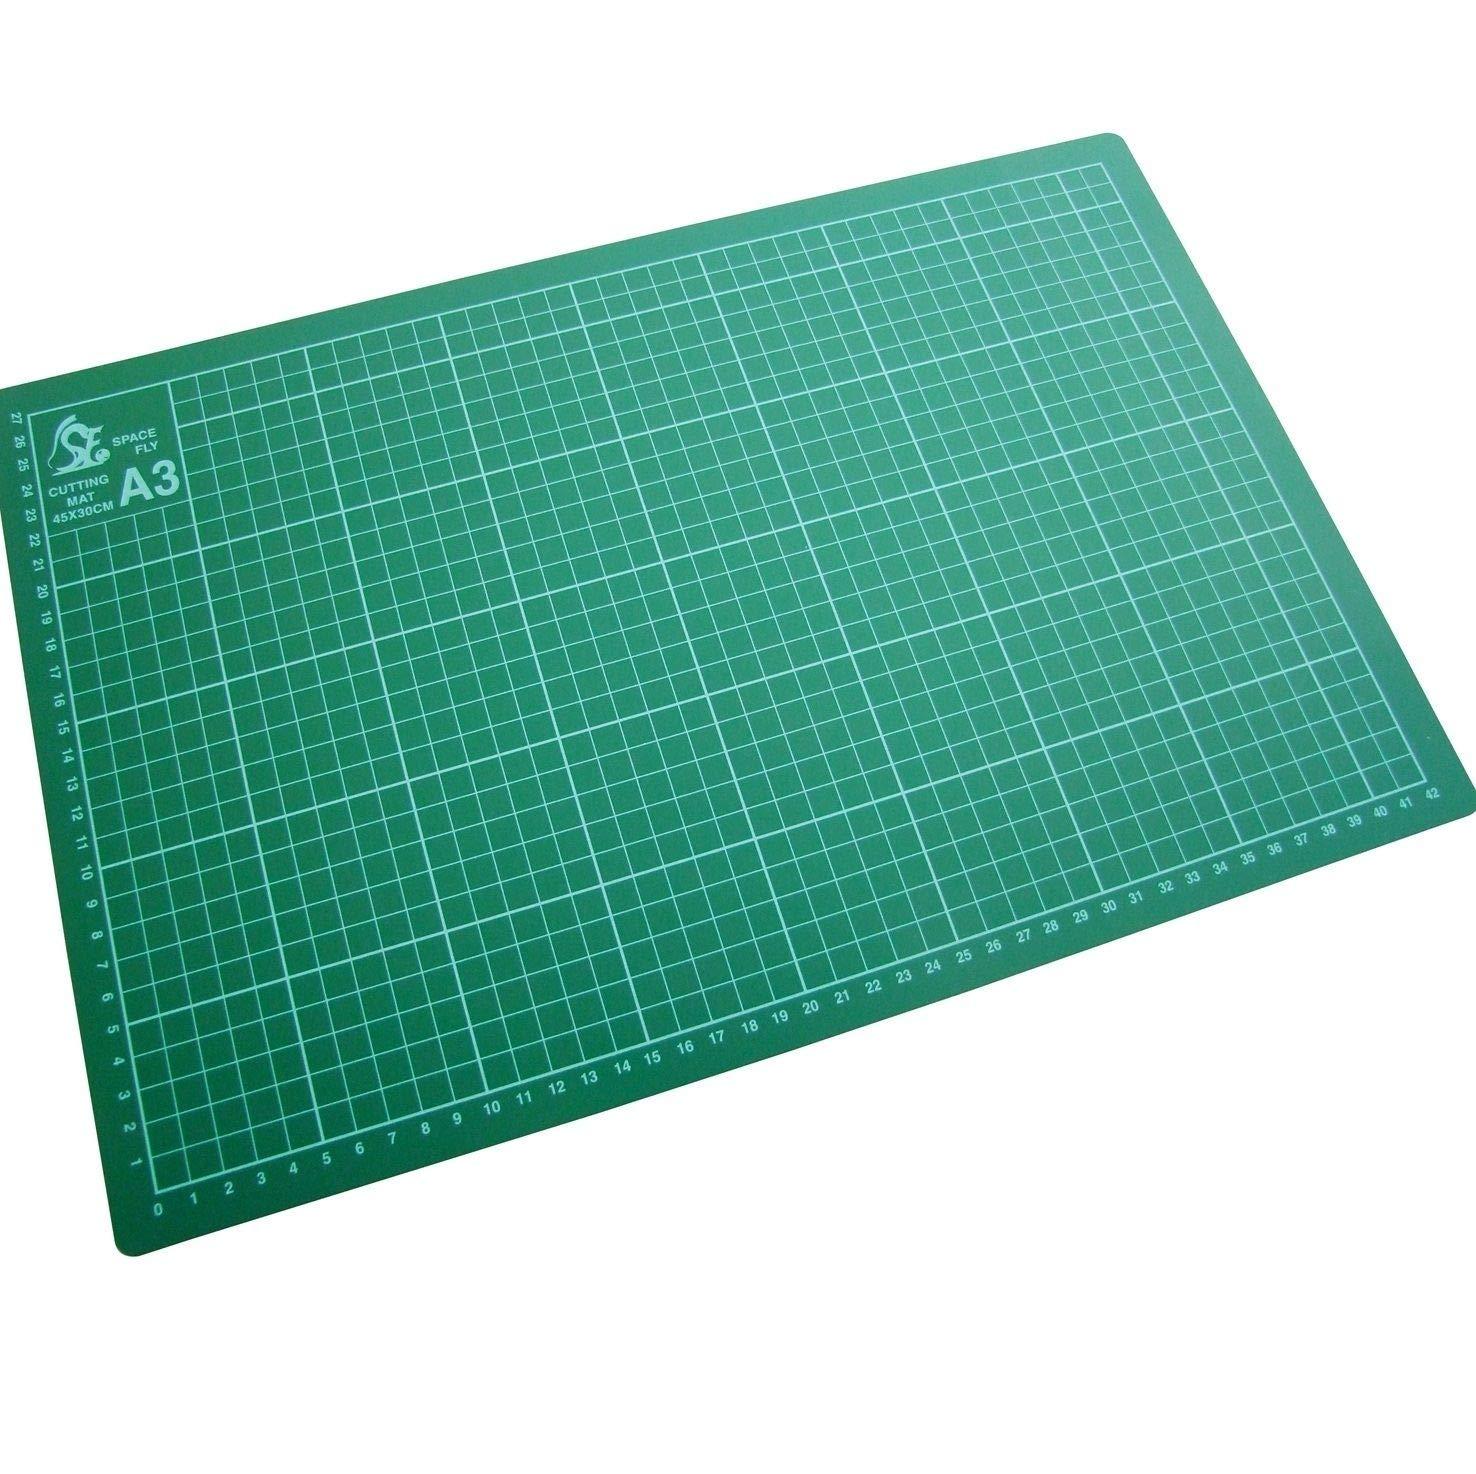 A2 / A3 / A4 Cutting Mat Knife Board Non Slip Self Healing Surface Protection (A2)